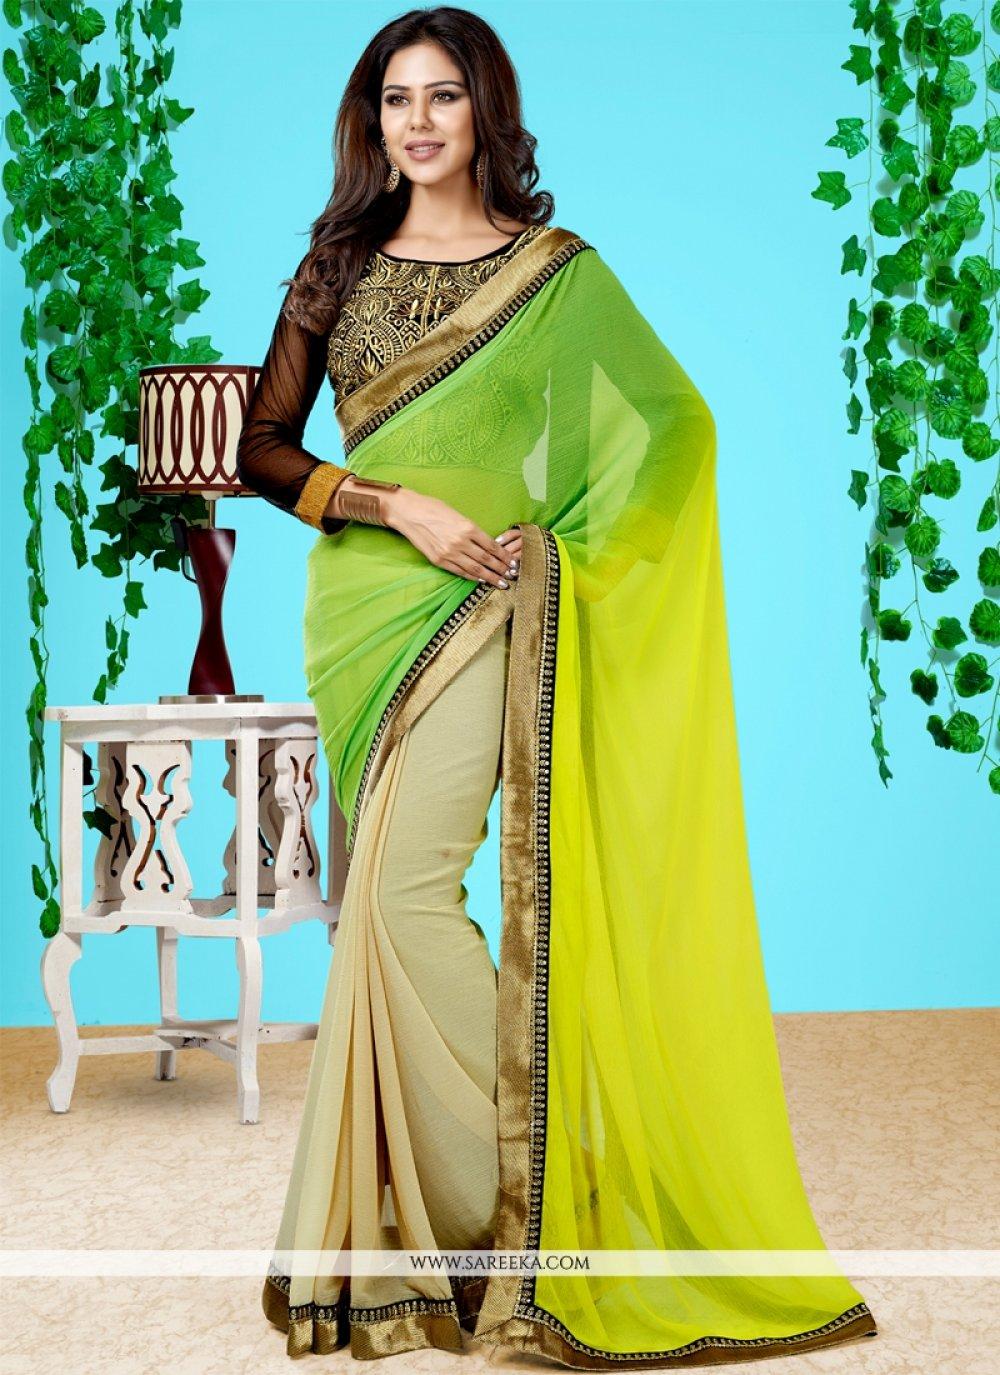 Faux Chiffon Green and Yellow Embroidered Work Designer Half N Half saree